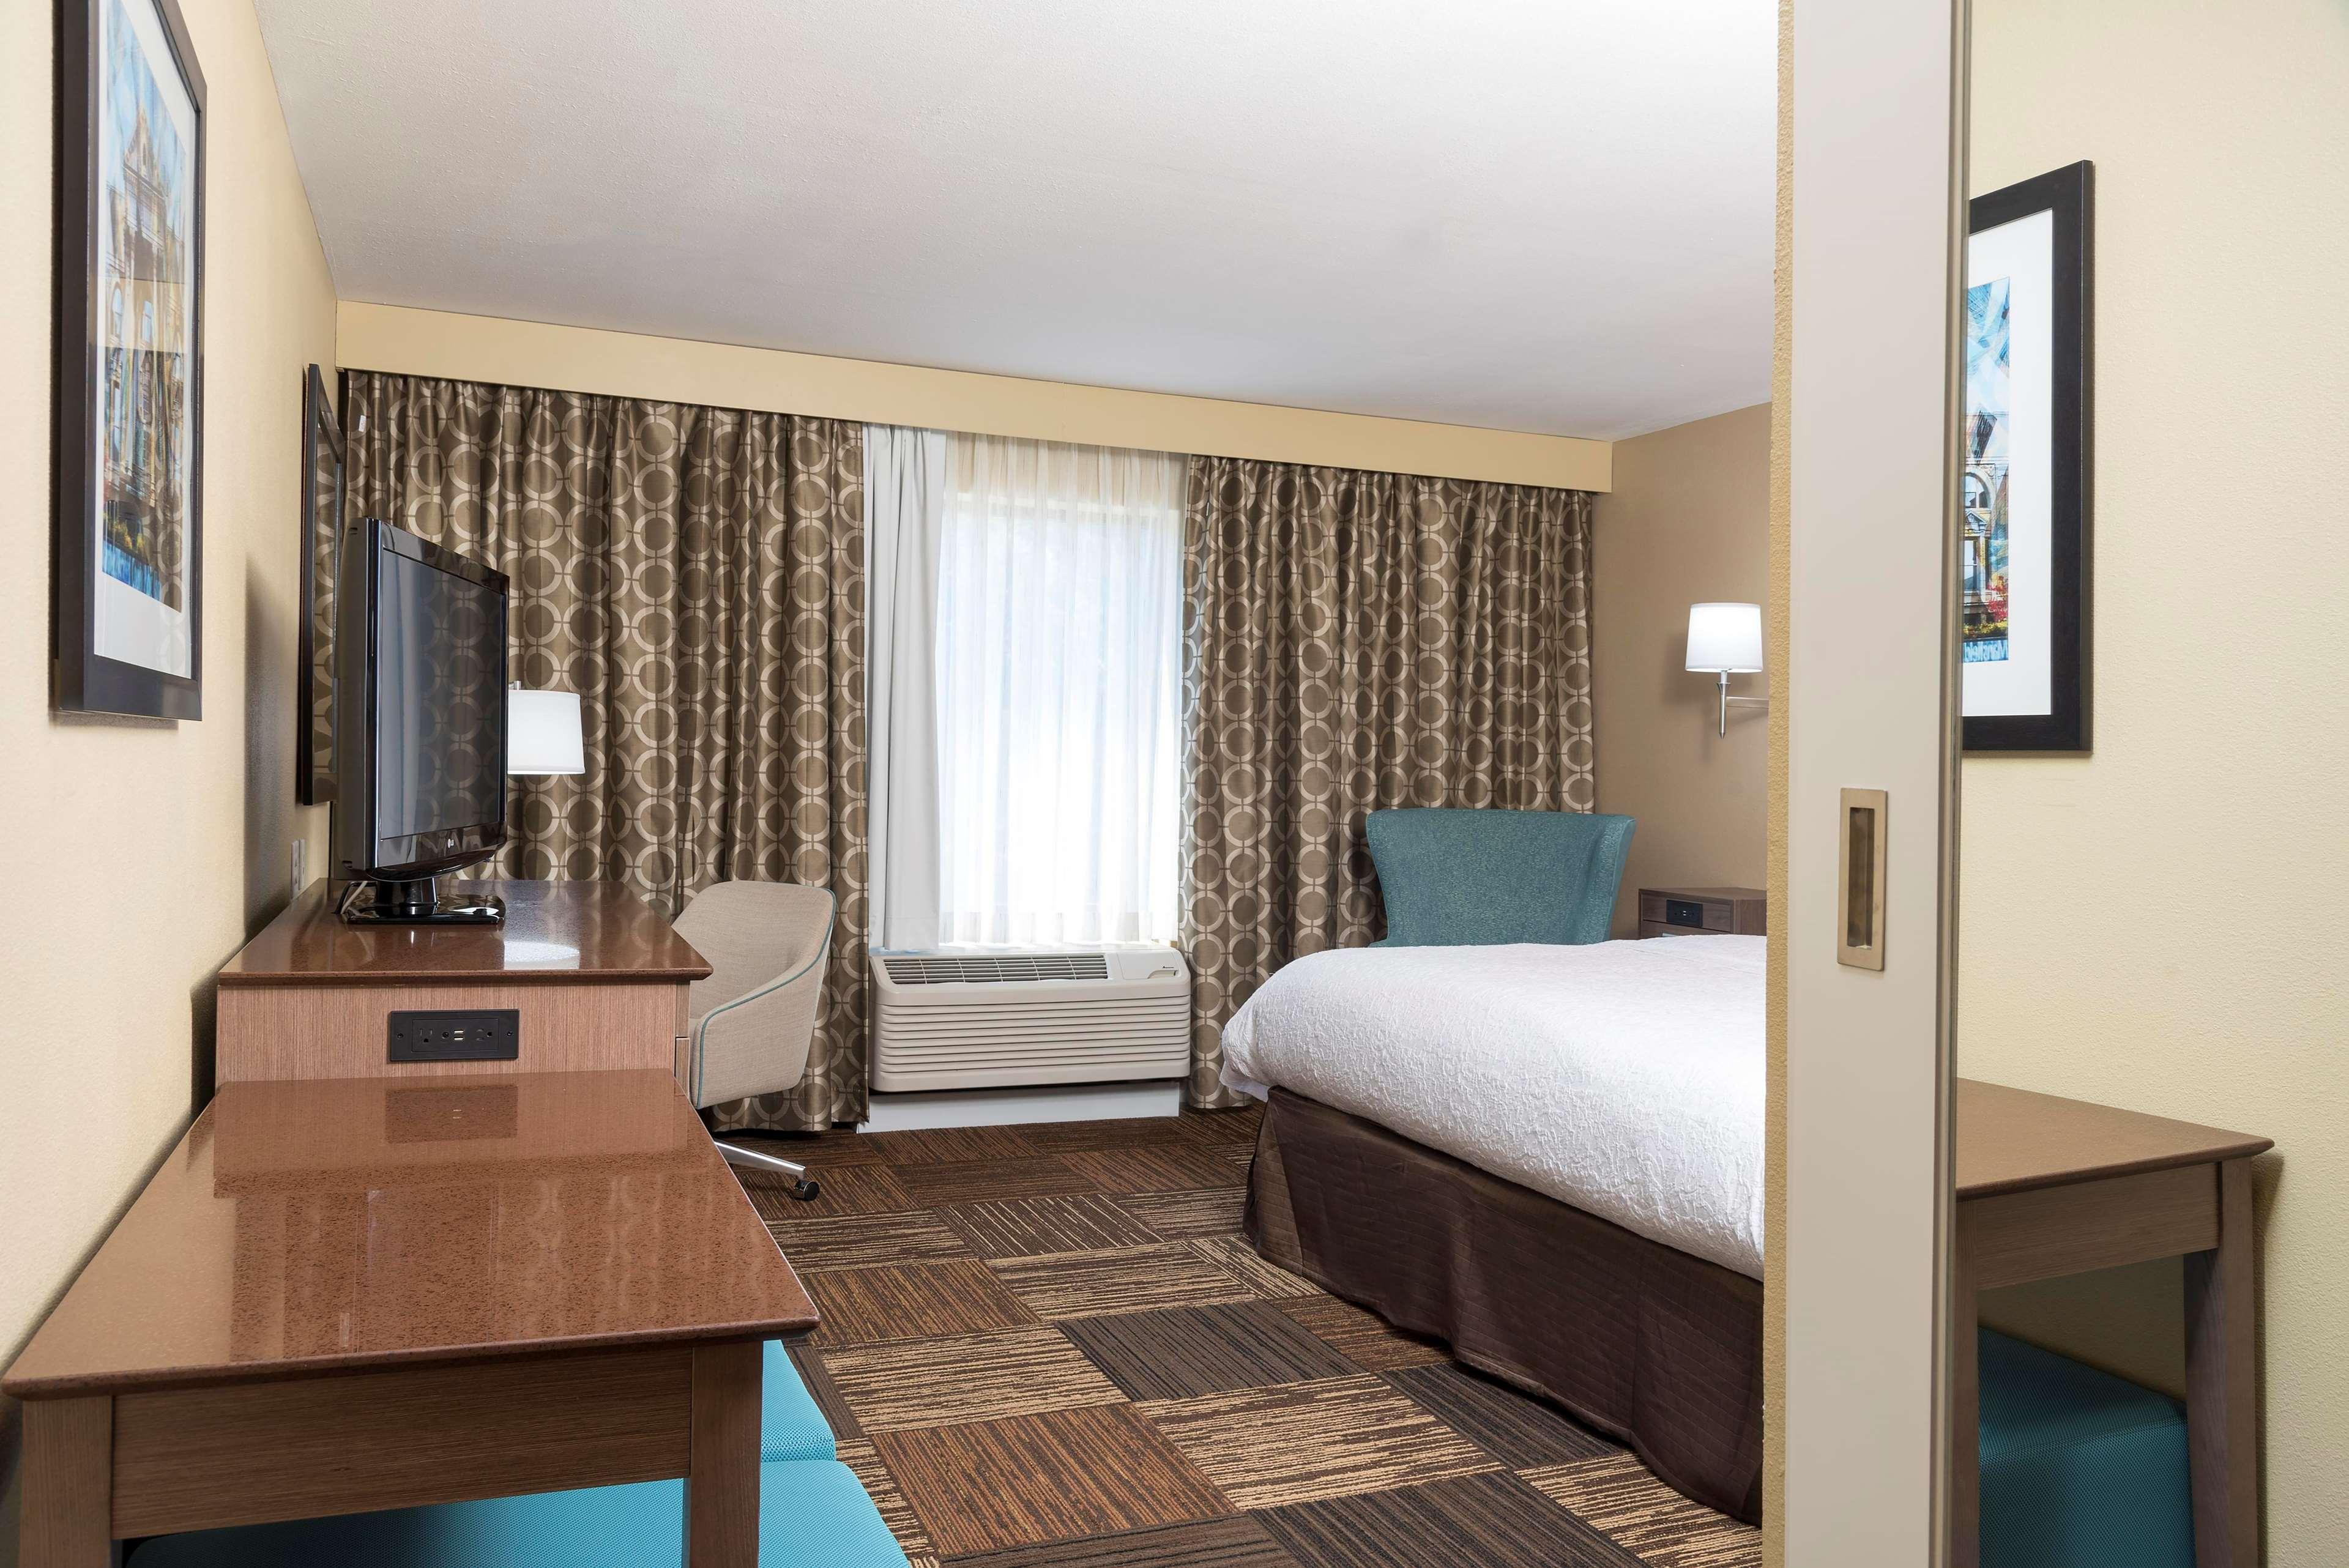 Hampton Inn & Suites Mansfield-South @ I-71 image 19